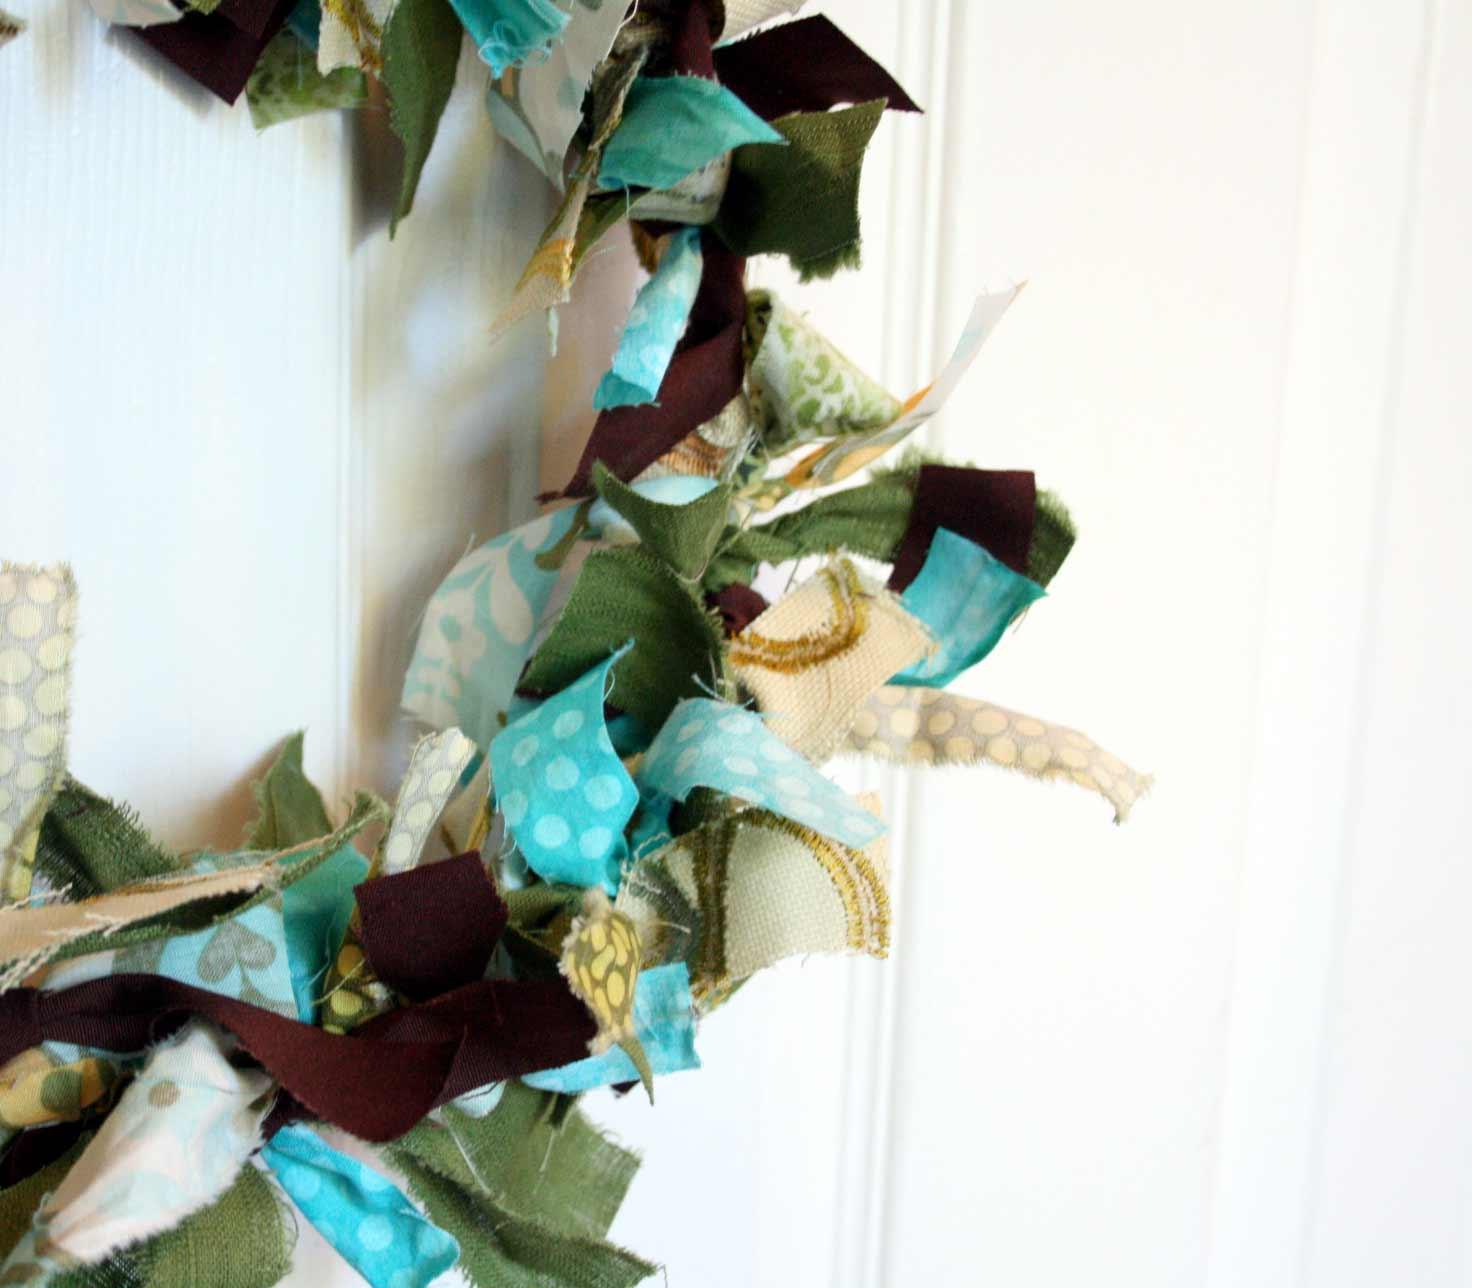 Blukatkraft Easy Diy Scrap Fabric Ribbon Wreath: The Creative Place: Friday Fun: DIY Fabric Scrap Wreath